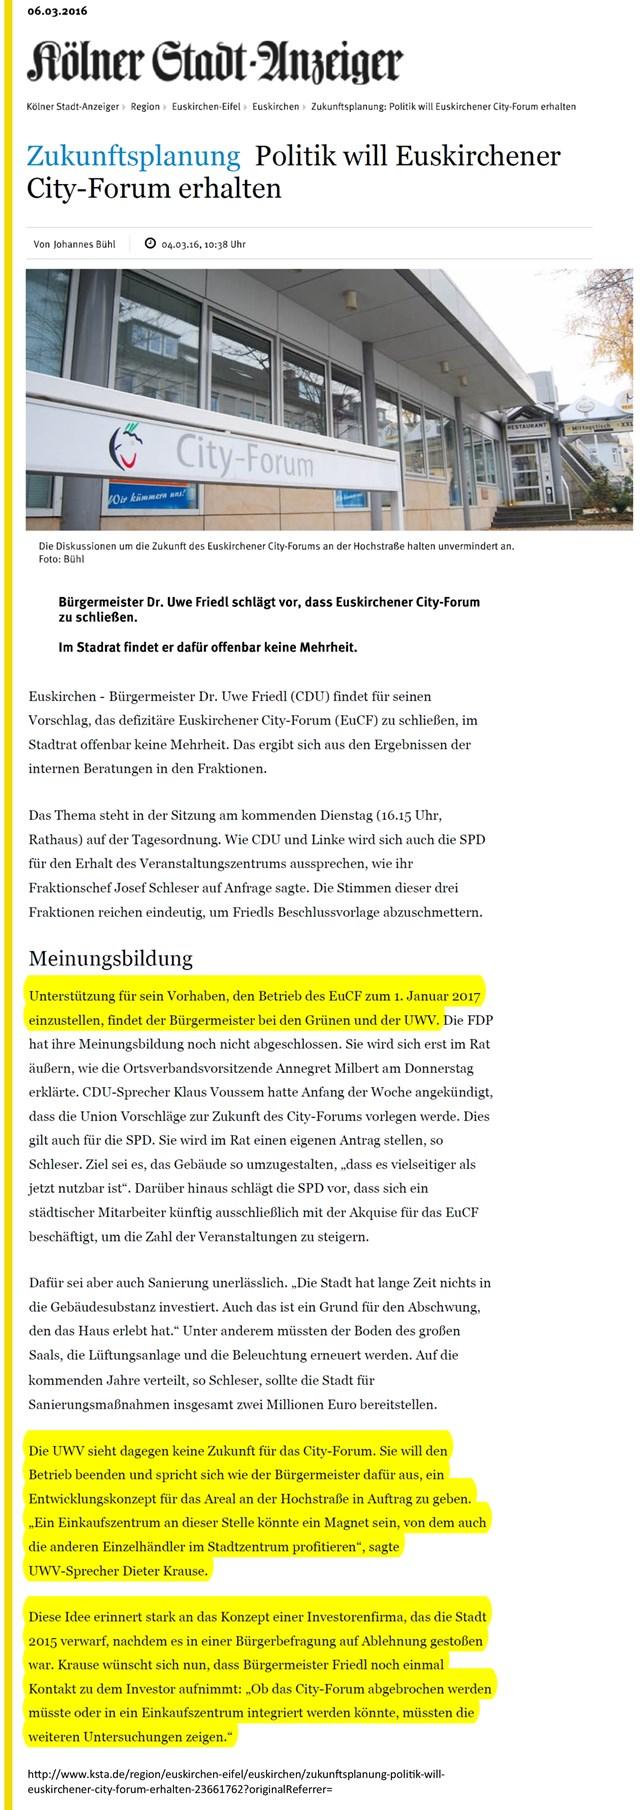 Politik will Euskirchener City-Forum erhalten - KSTA